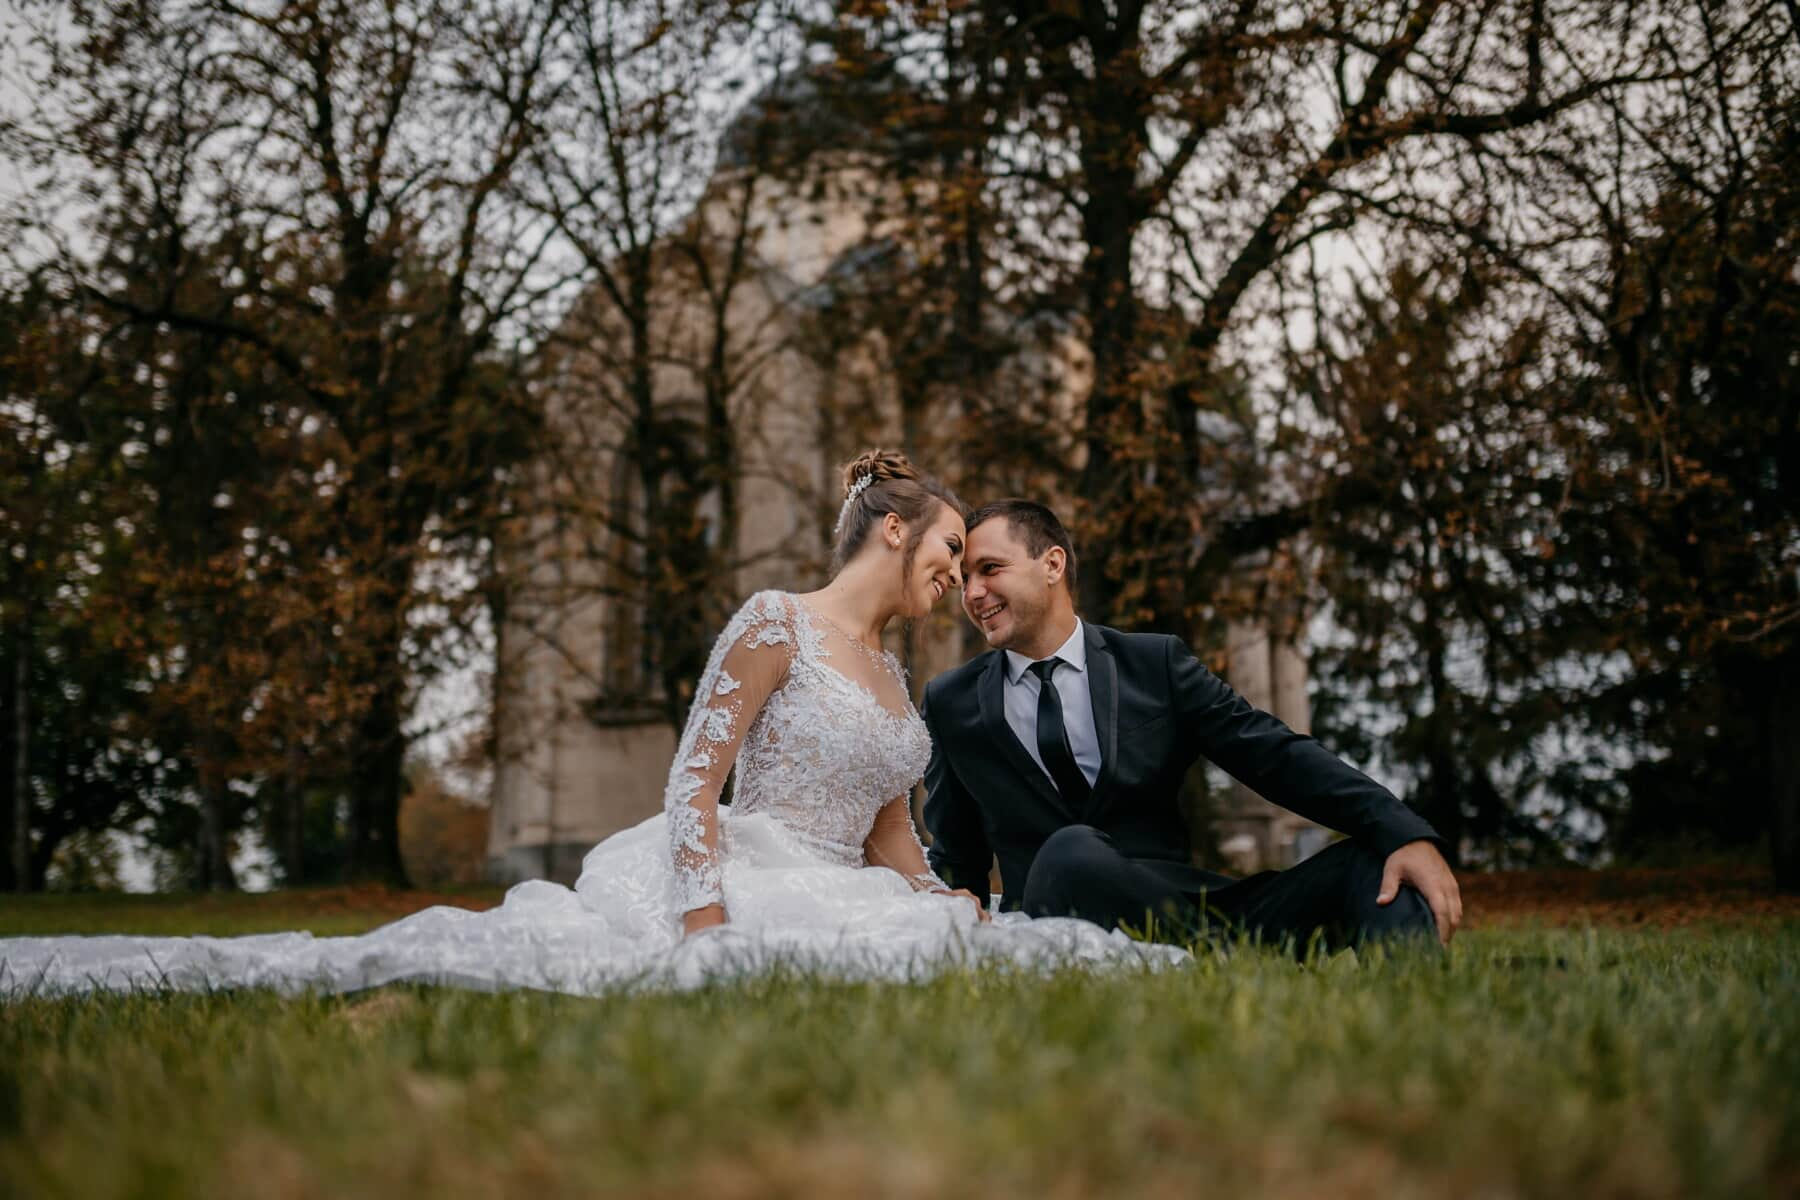 bride, picnic, groom, green grass, enjoyment, outside, love, couple, wedding, marriage